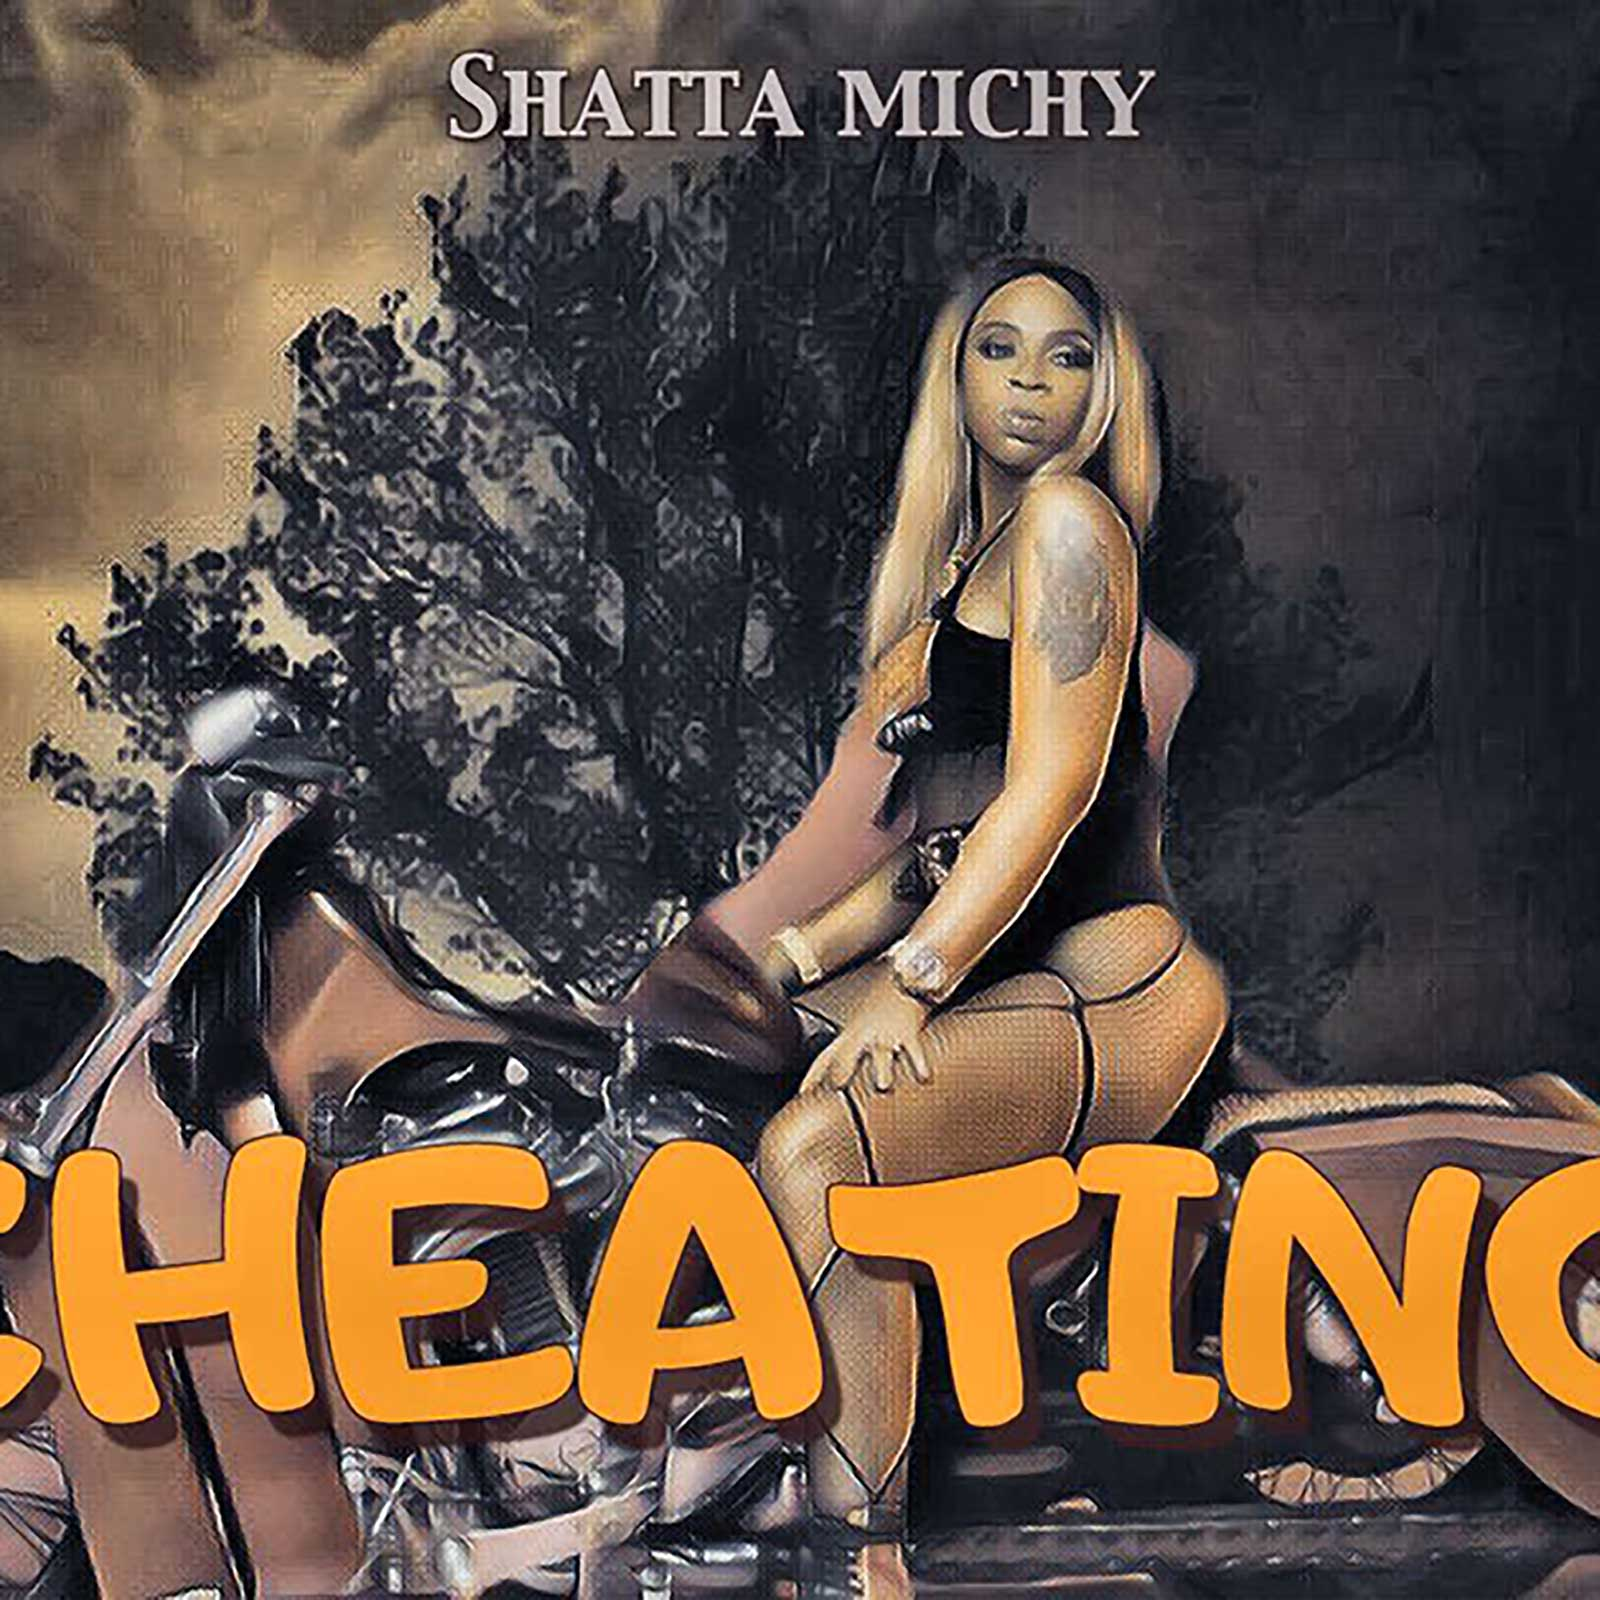 Cheating by Shatta Michy